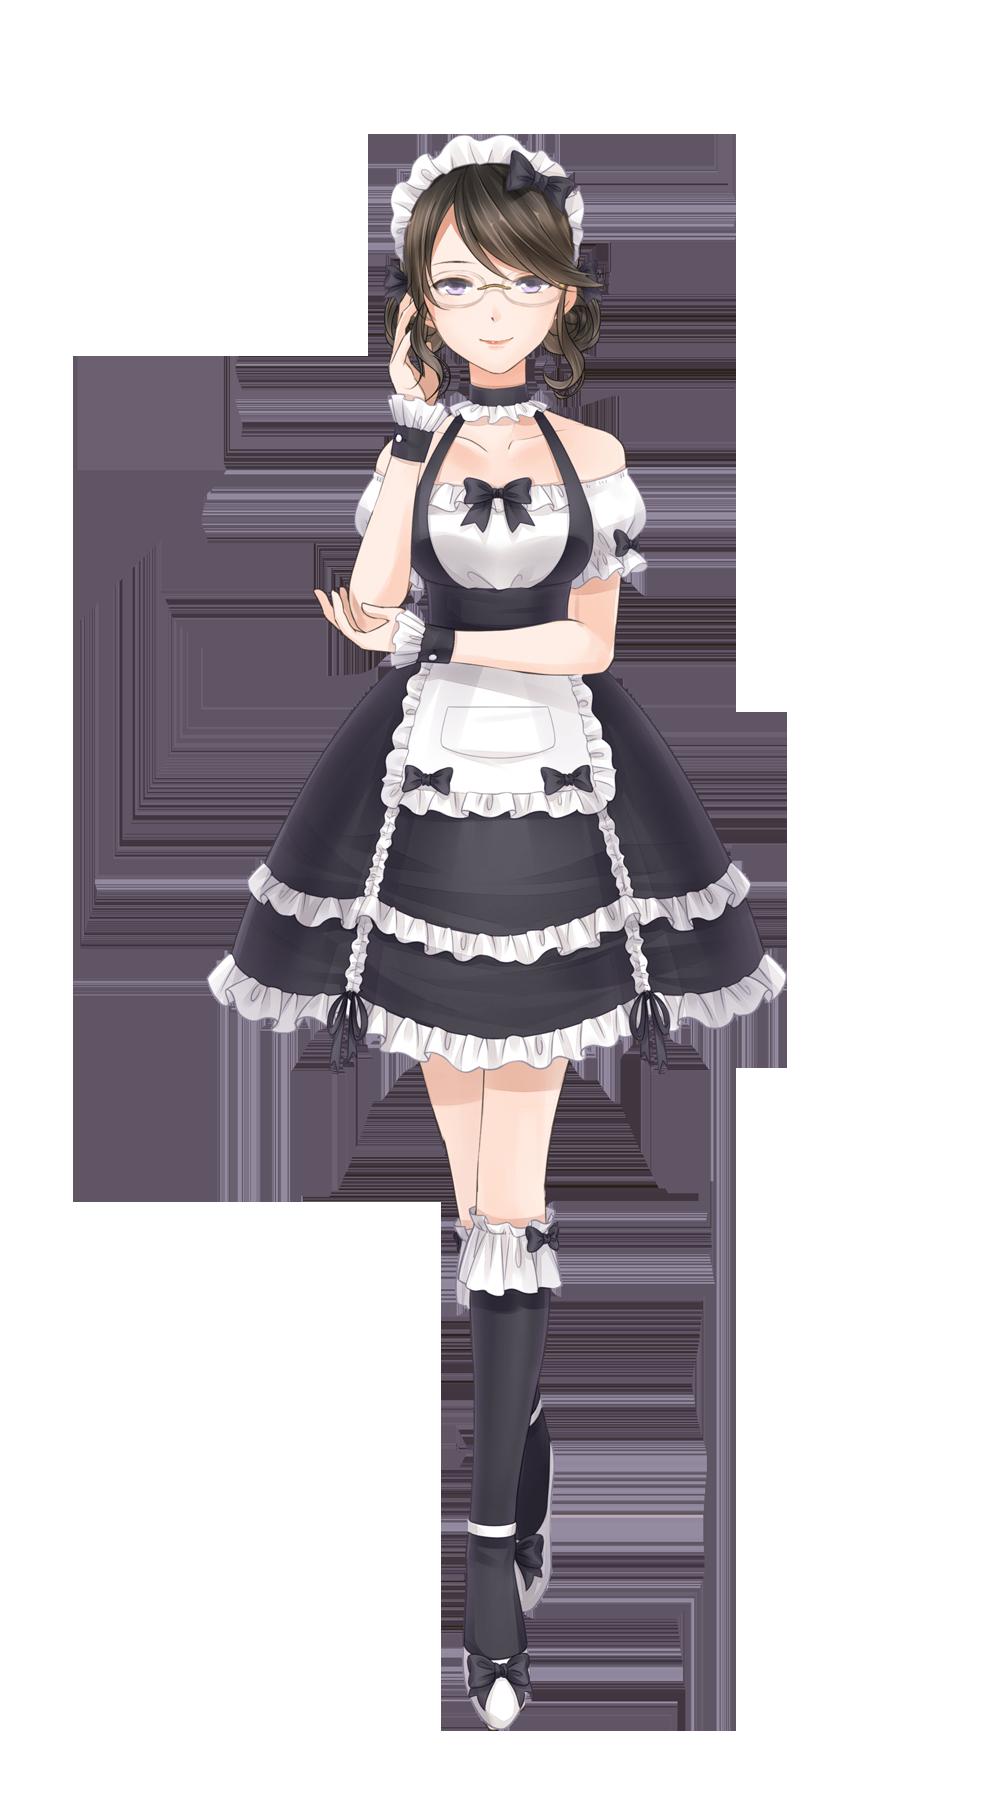 Anime Maid Outfits